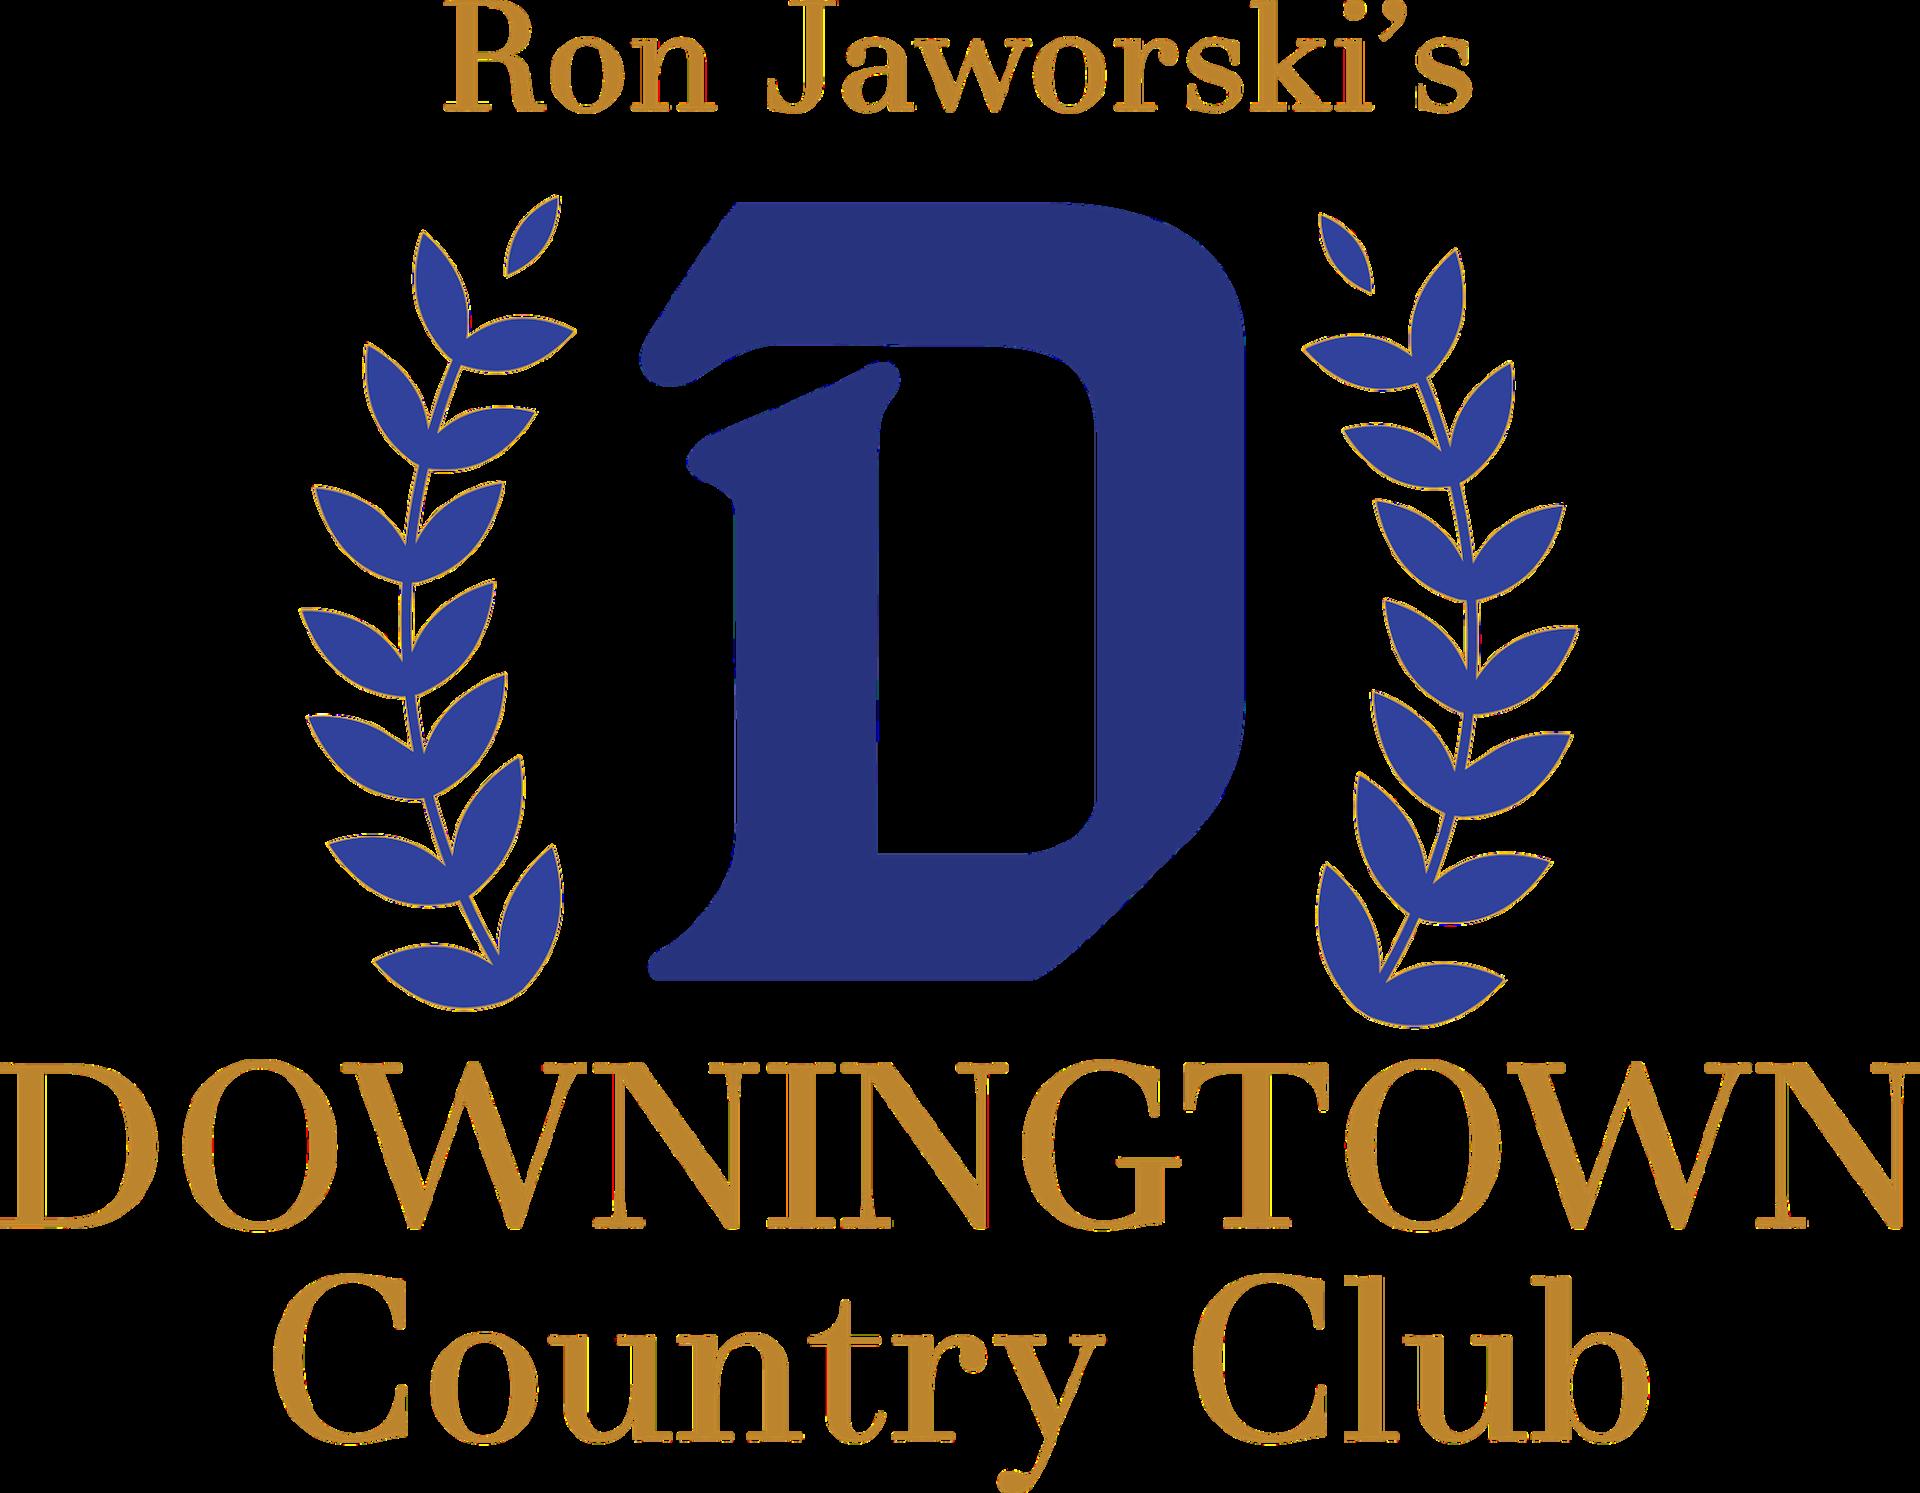 Downingtown Country Club